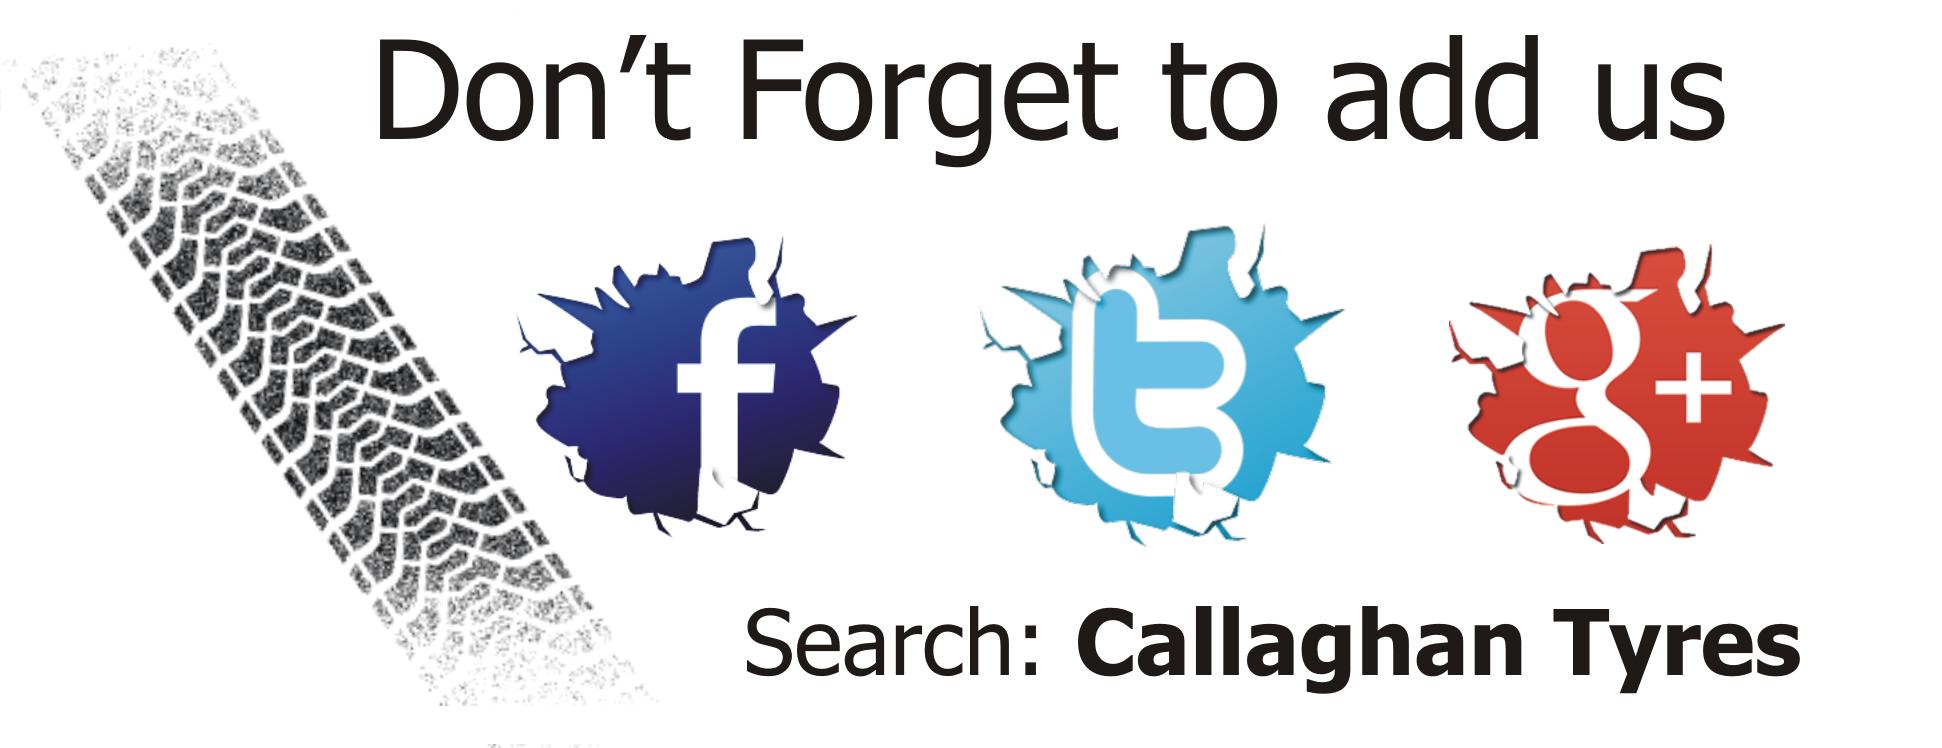 social-media-join-us-image